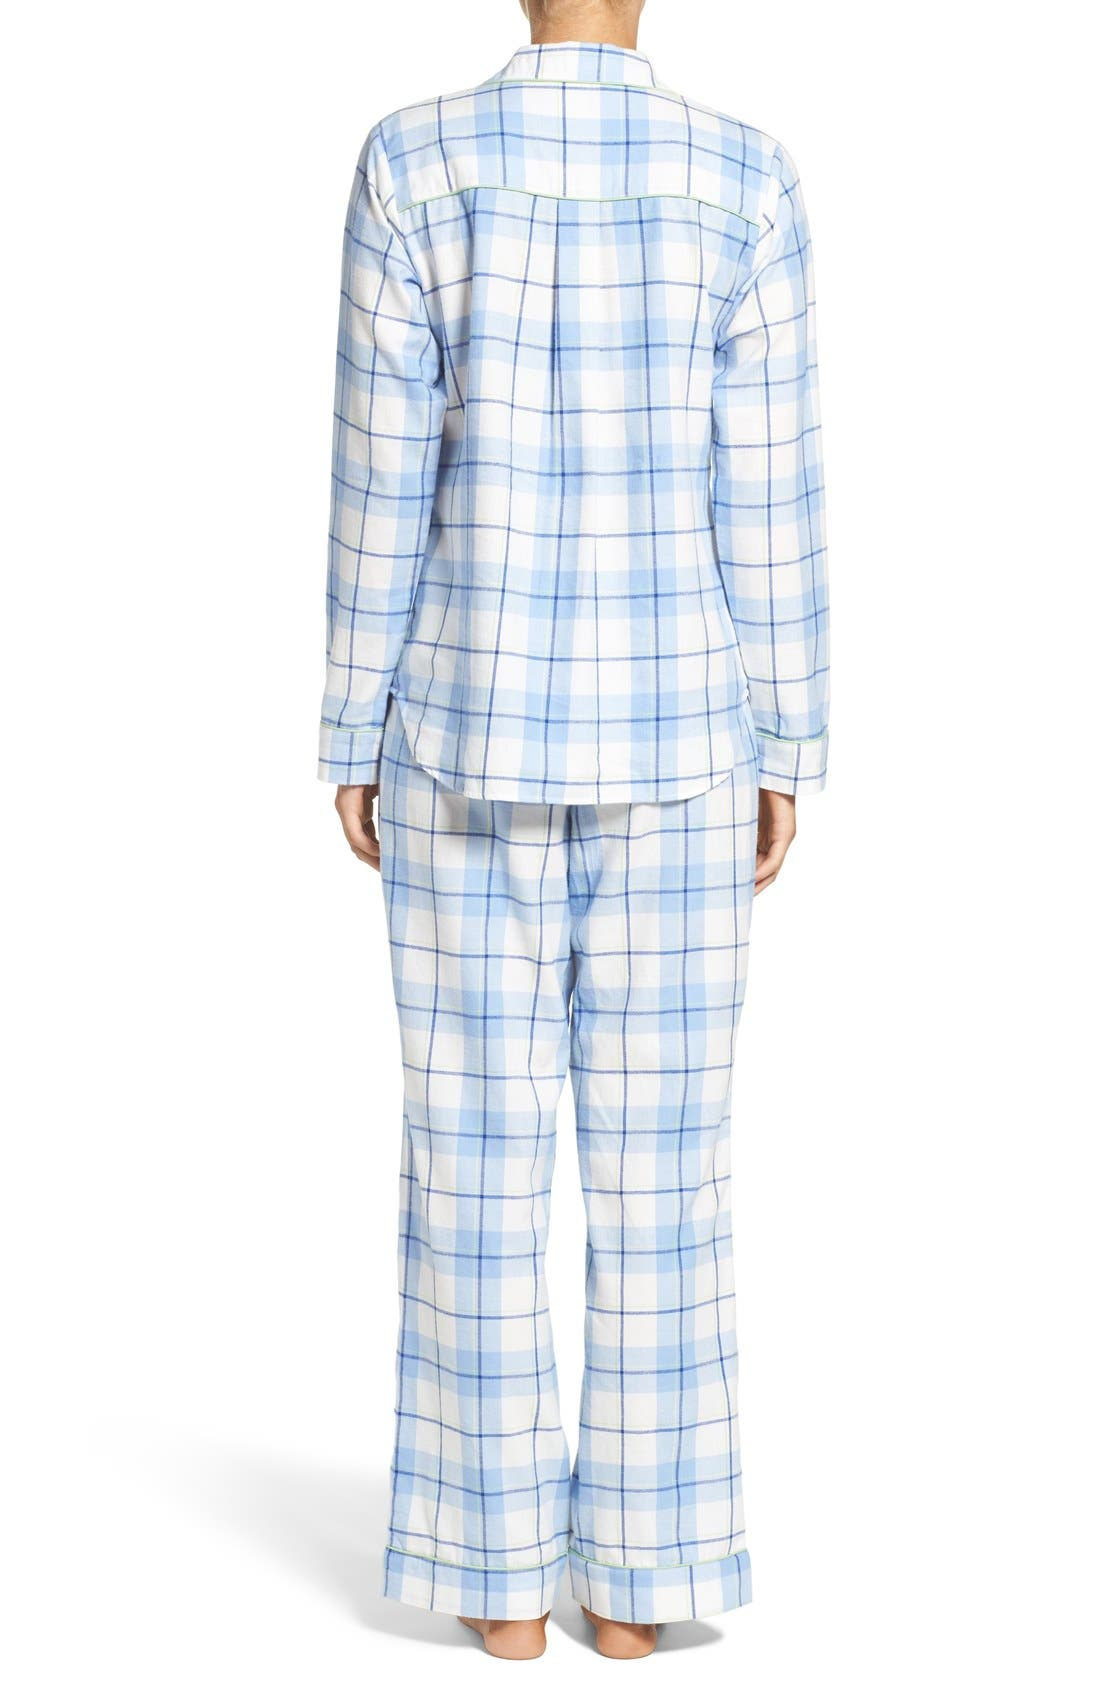 'Raven' Plaid Cotton Pajamas,                             Alternate thumbnail 3, color,                             410